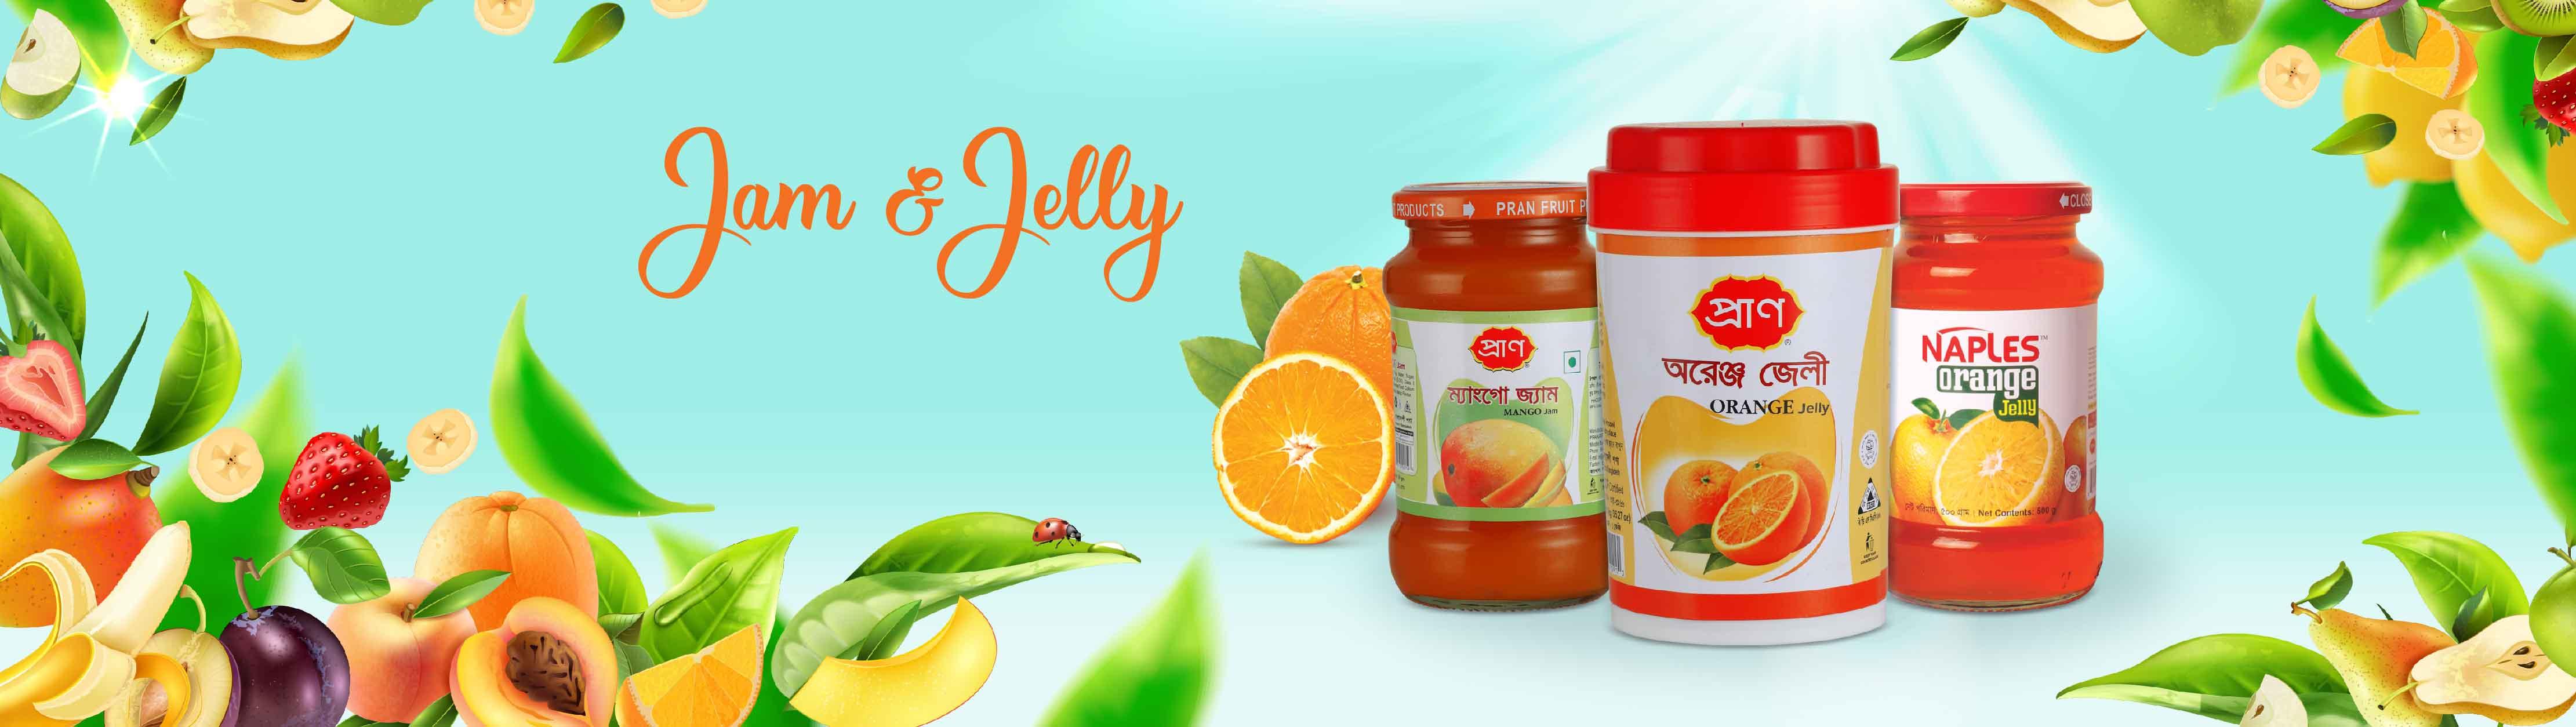 Jam & Jelly